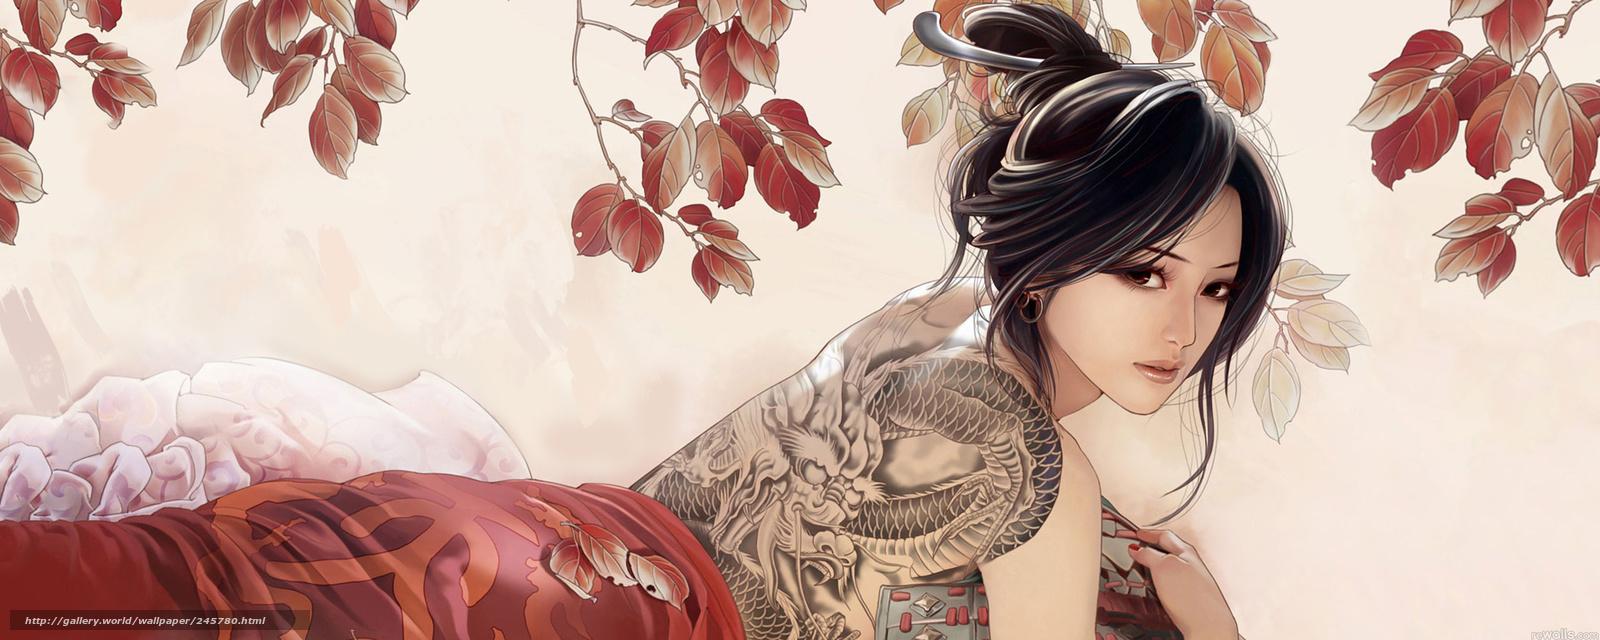 Download wallpaper Asian tattoo dragon desktop wallpaper in the 1600x640